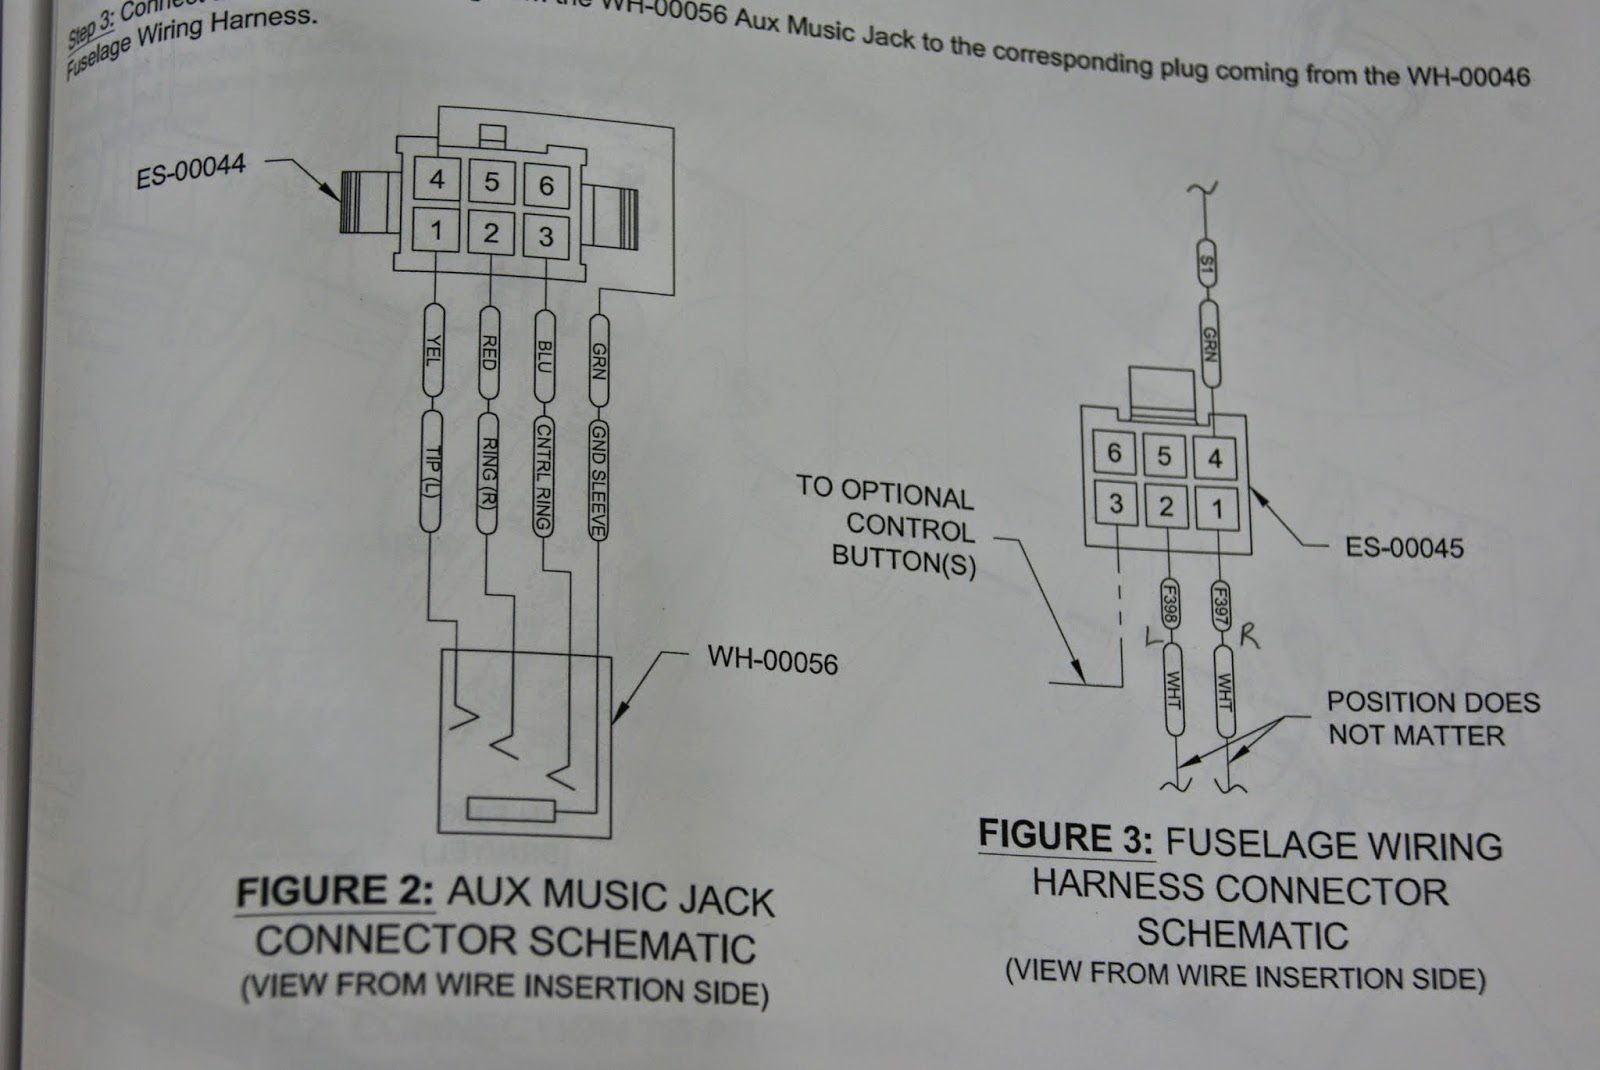 Garmin Gtr 200 Wiring Harness Search For Diagrams Dog Aviation John S Rv 12 Blog Small Error In Auxiliary Vhf Radio 225